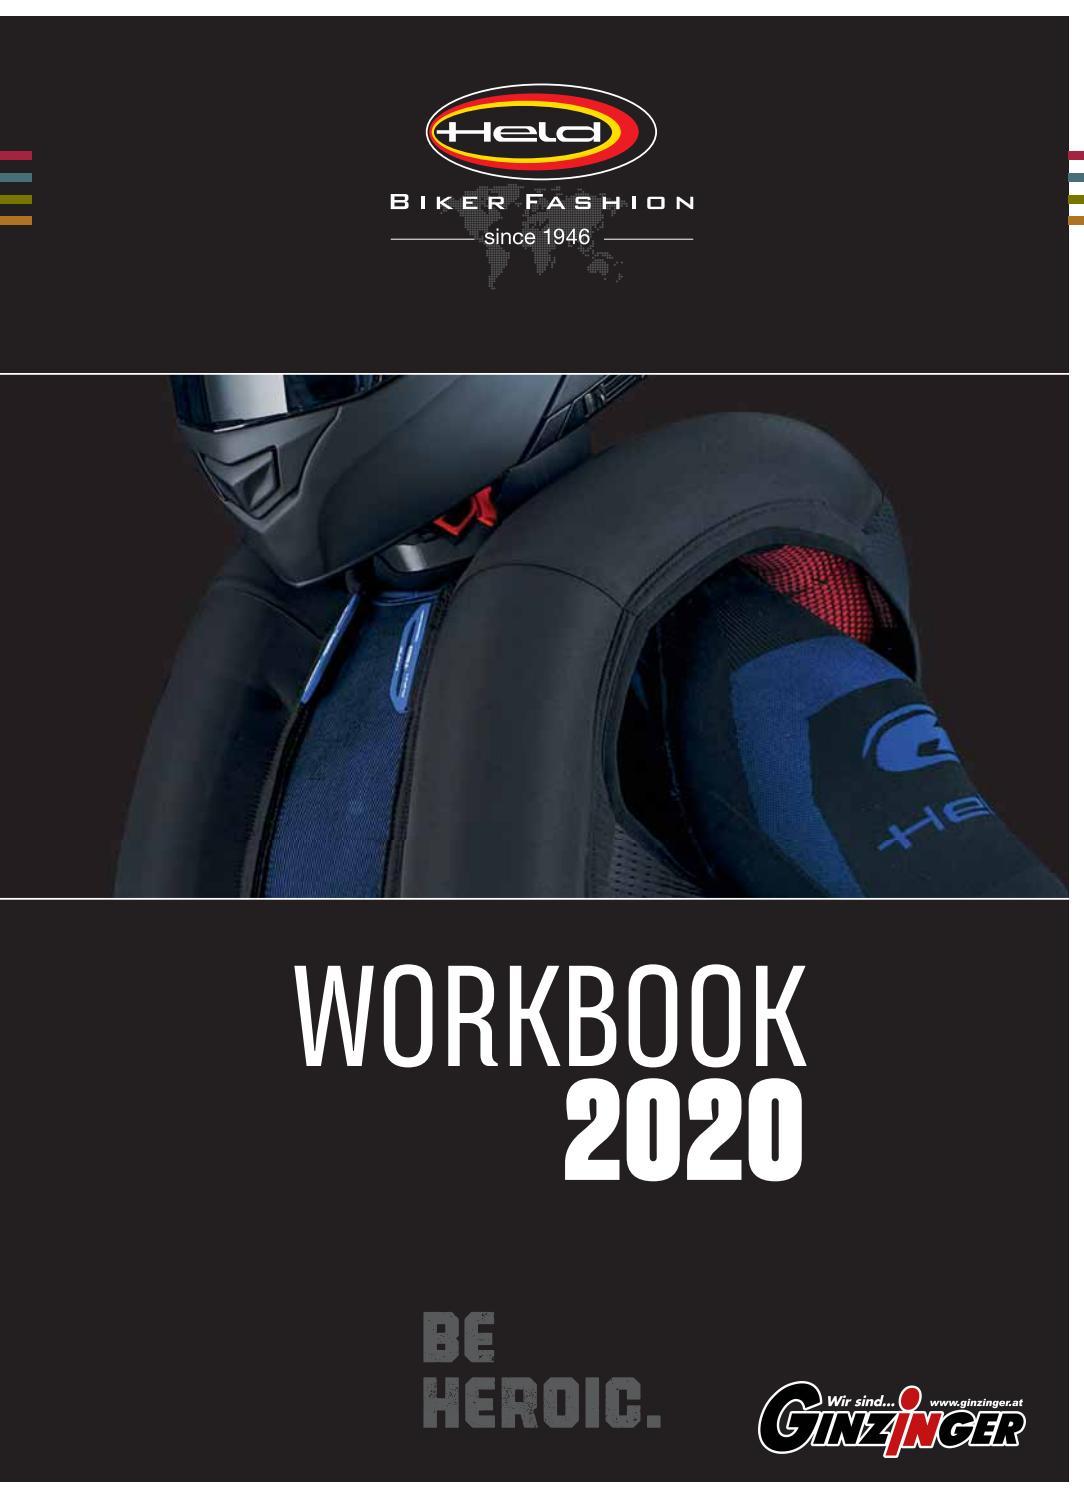 Held Katalog 2020 by Ginzinger Zweirad issuu